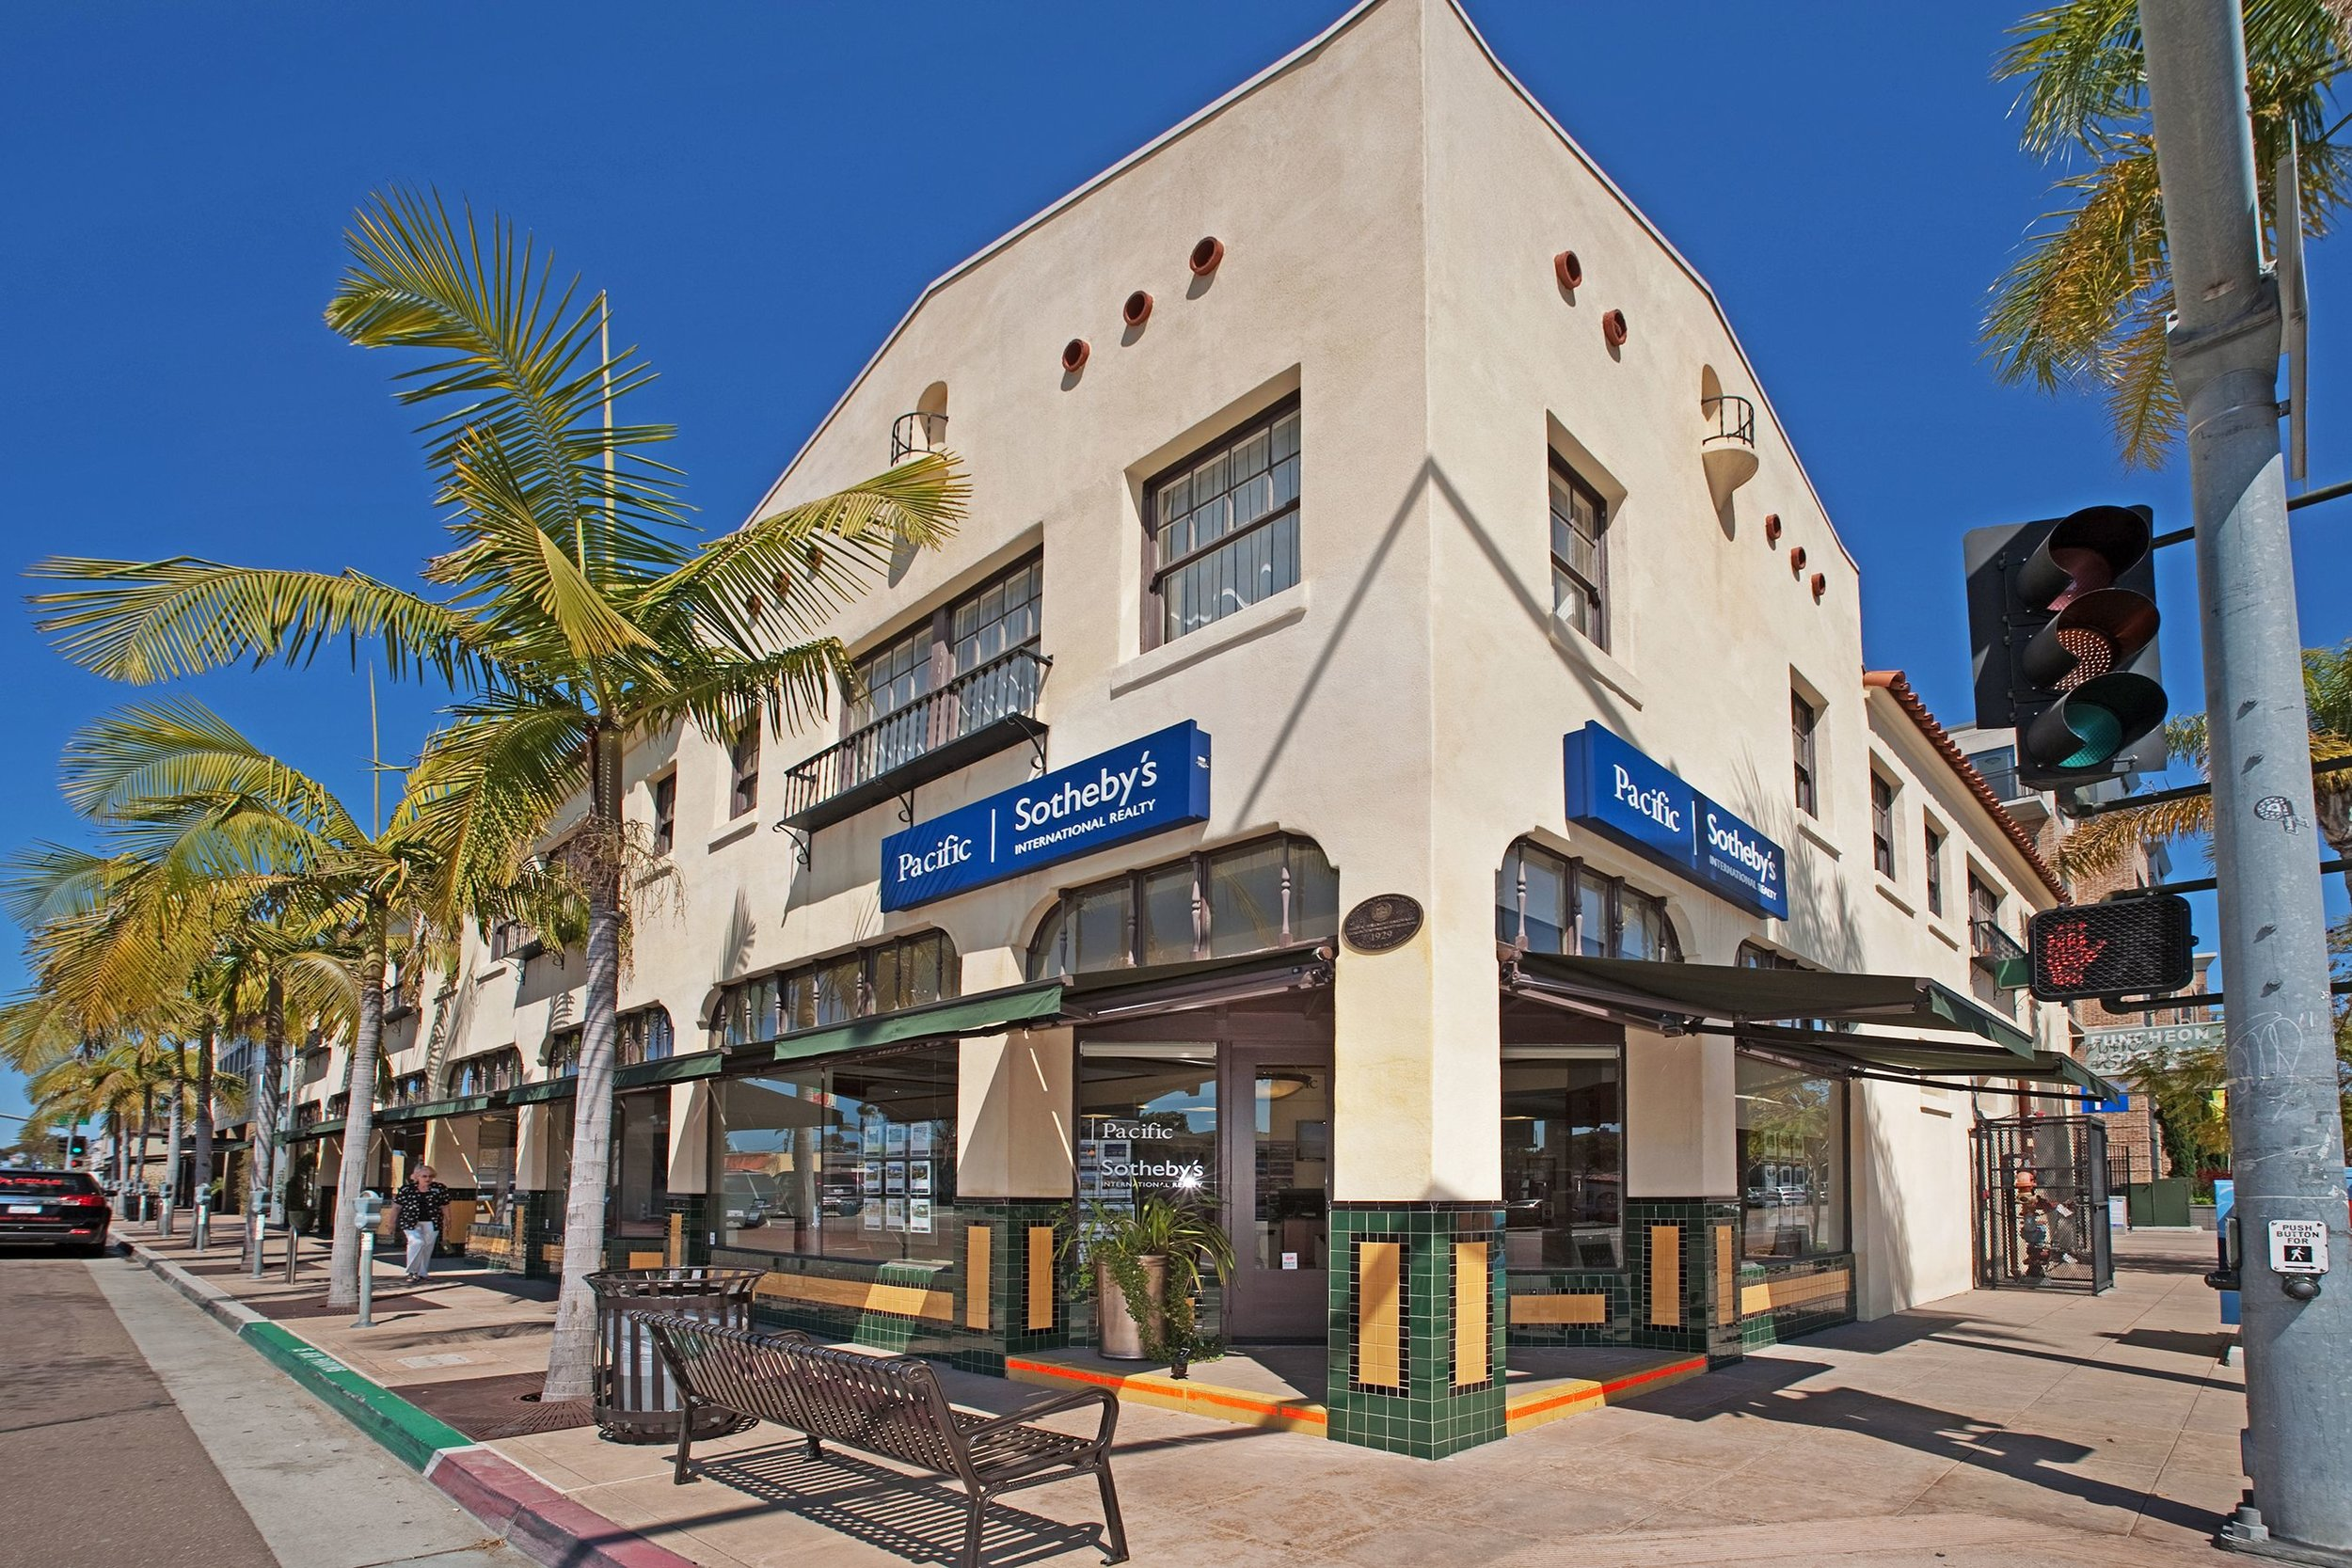 Mission Hills   810 West Washington Street  San Diego, California 92103  619.269.2277  Languages: English, Spanish